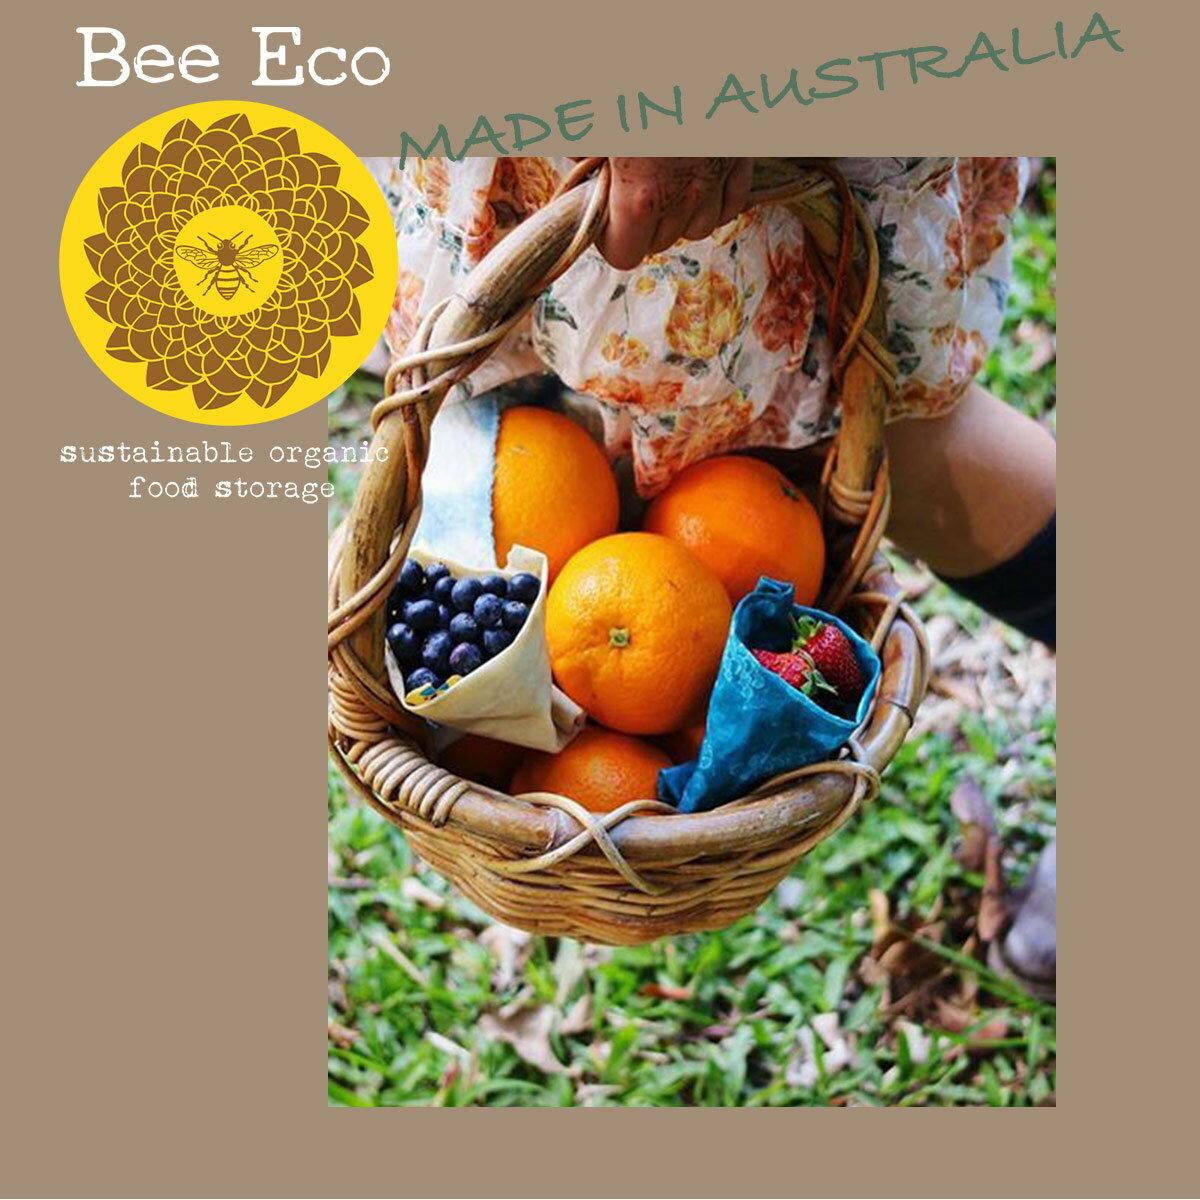 BeeEcoWrapビーエコラップラップオーガニックエコエコ生活フードラップオーストラリア蜂ハチミツ生活用品食器マルチカラーインスタ映え